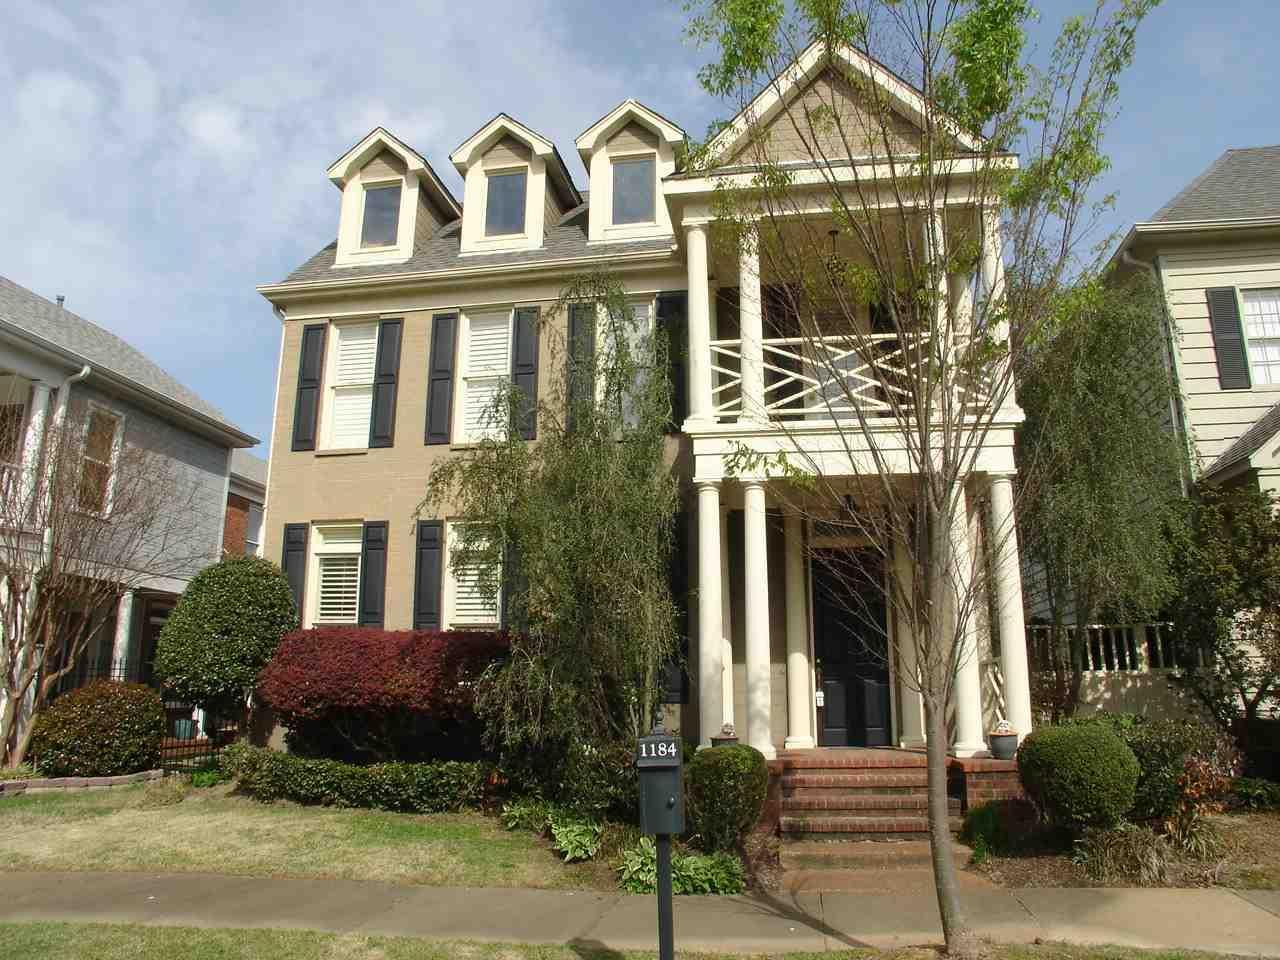 Local Real Estate: Homes for Sale — Cordova, TN — Coldwell Banker